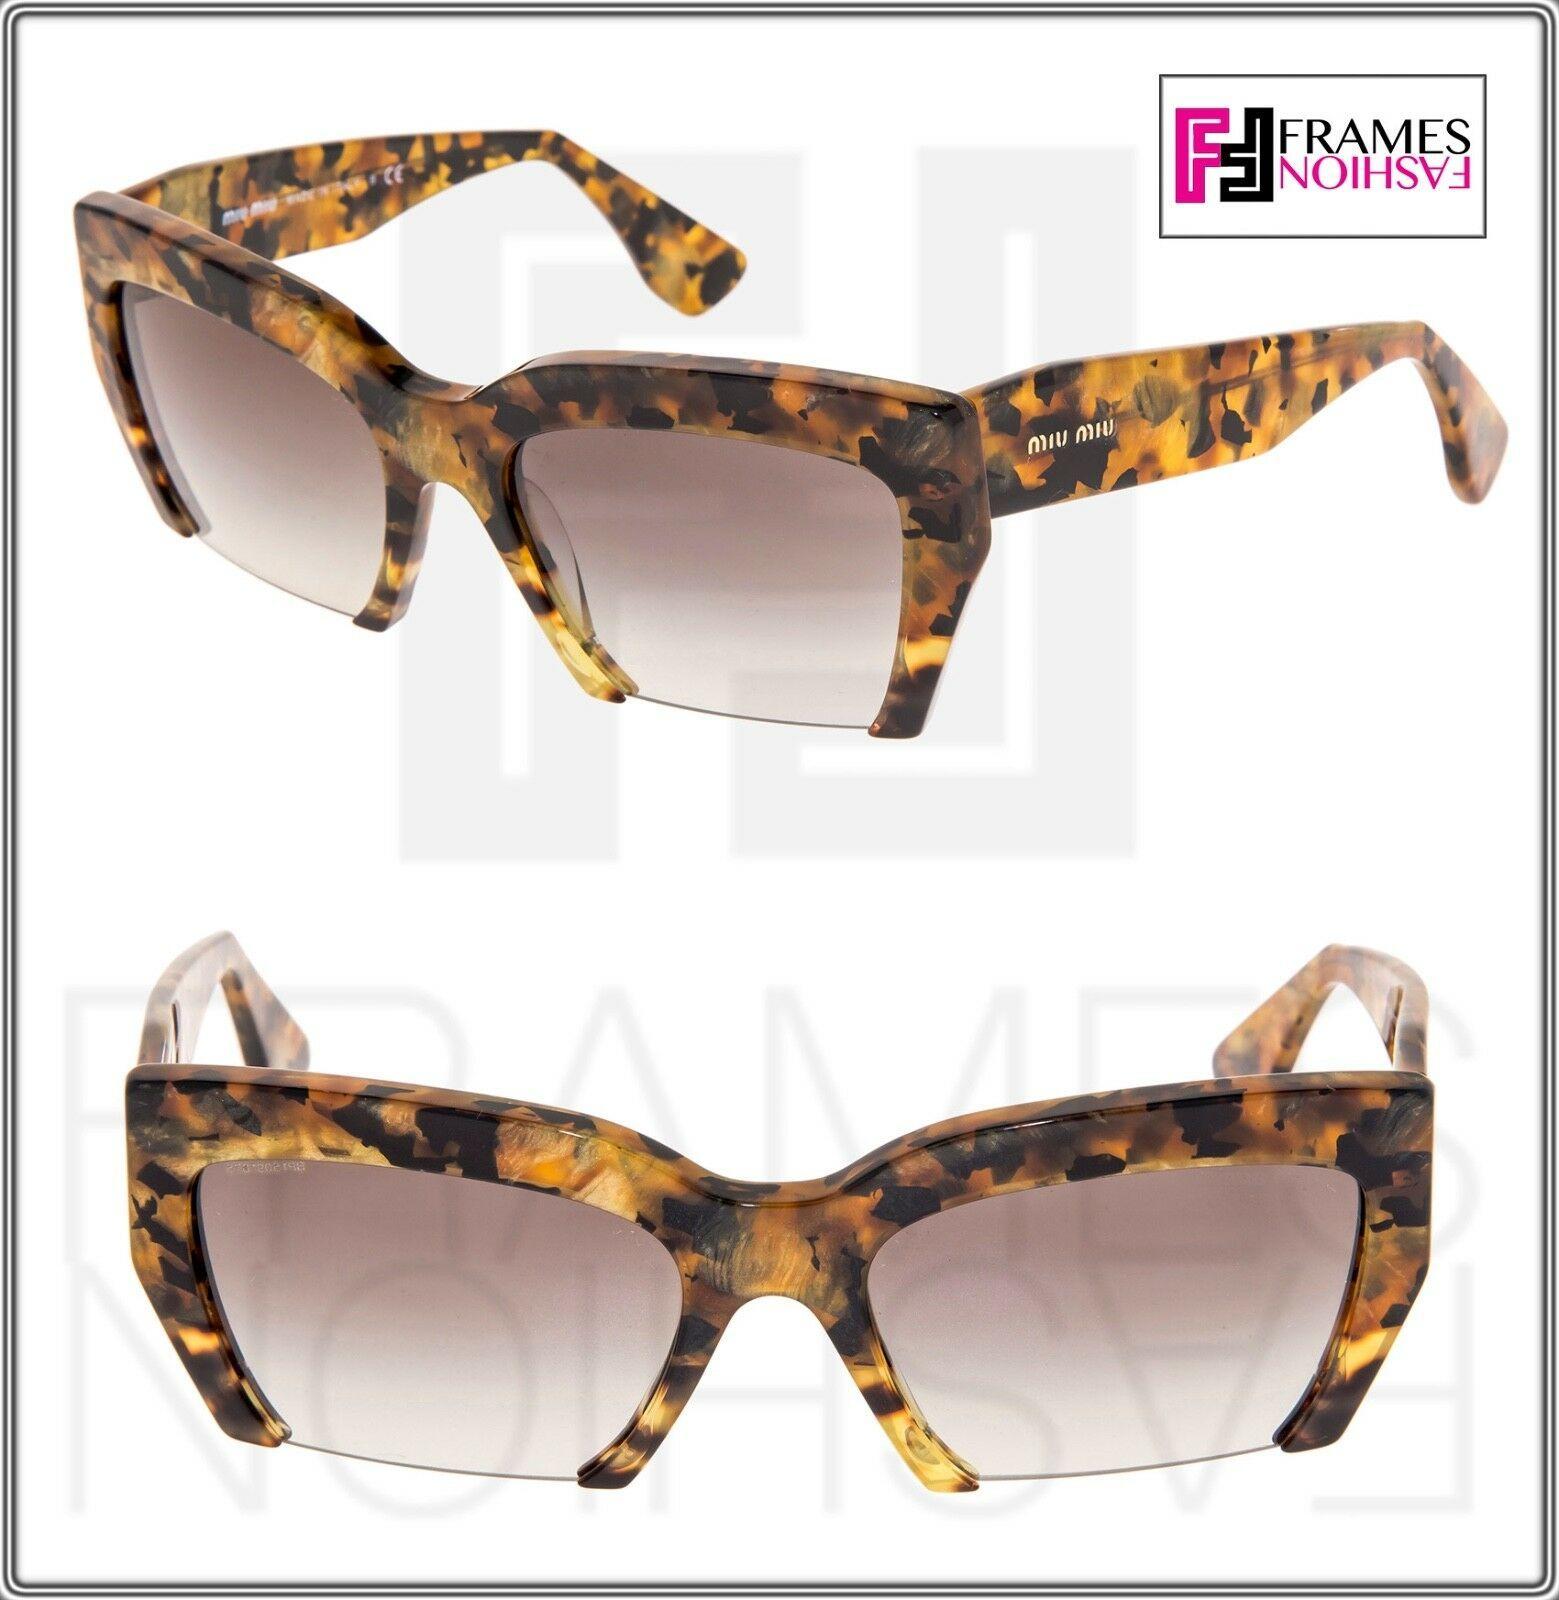 MIU MIU RASOIR 11O Square Sunglasses MAN-0A7 Caramel Marble Sunglasses MU11OS